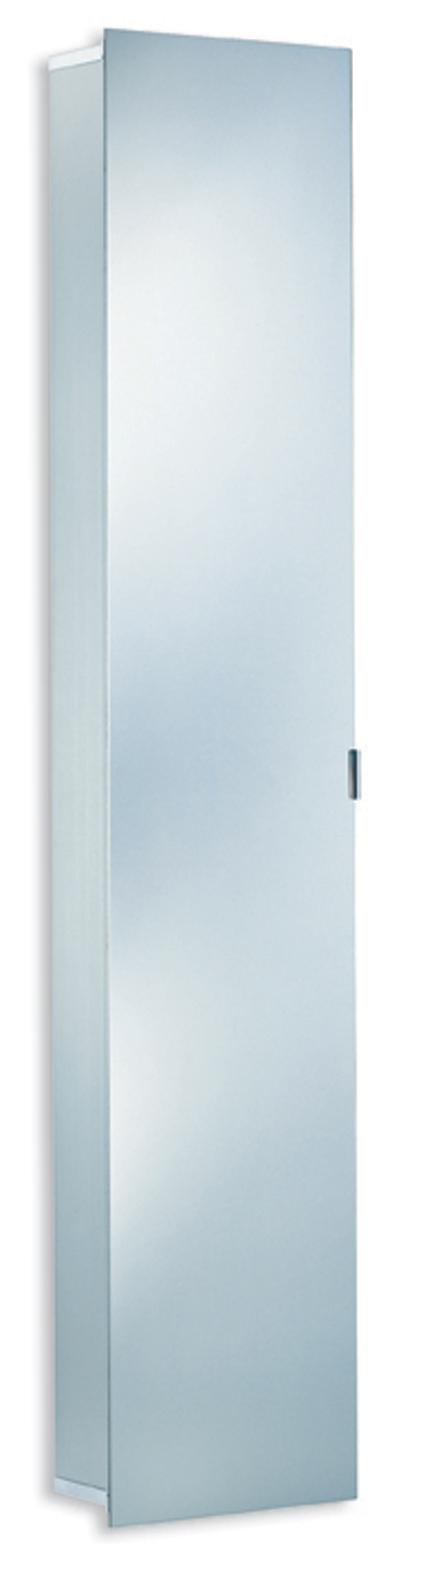 ASP 300 Alu Spiegelkast hoge kast. Afmetingen: B.35 x H.175 x D.17 cm